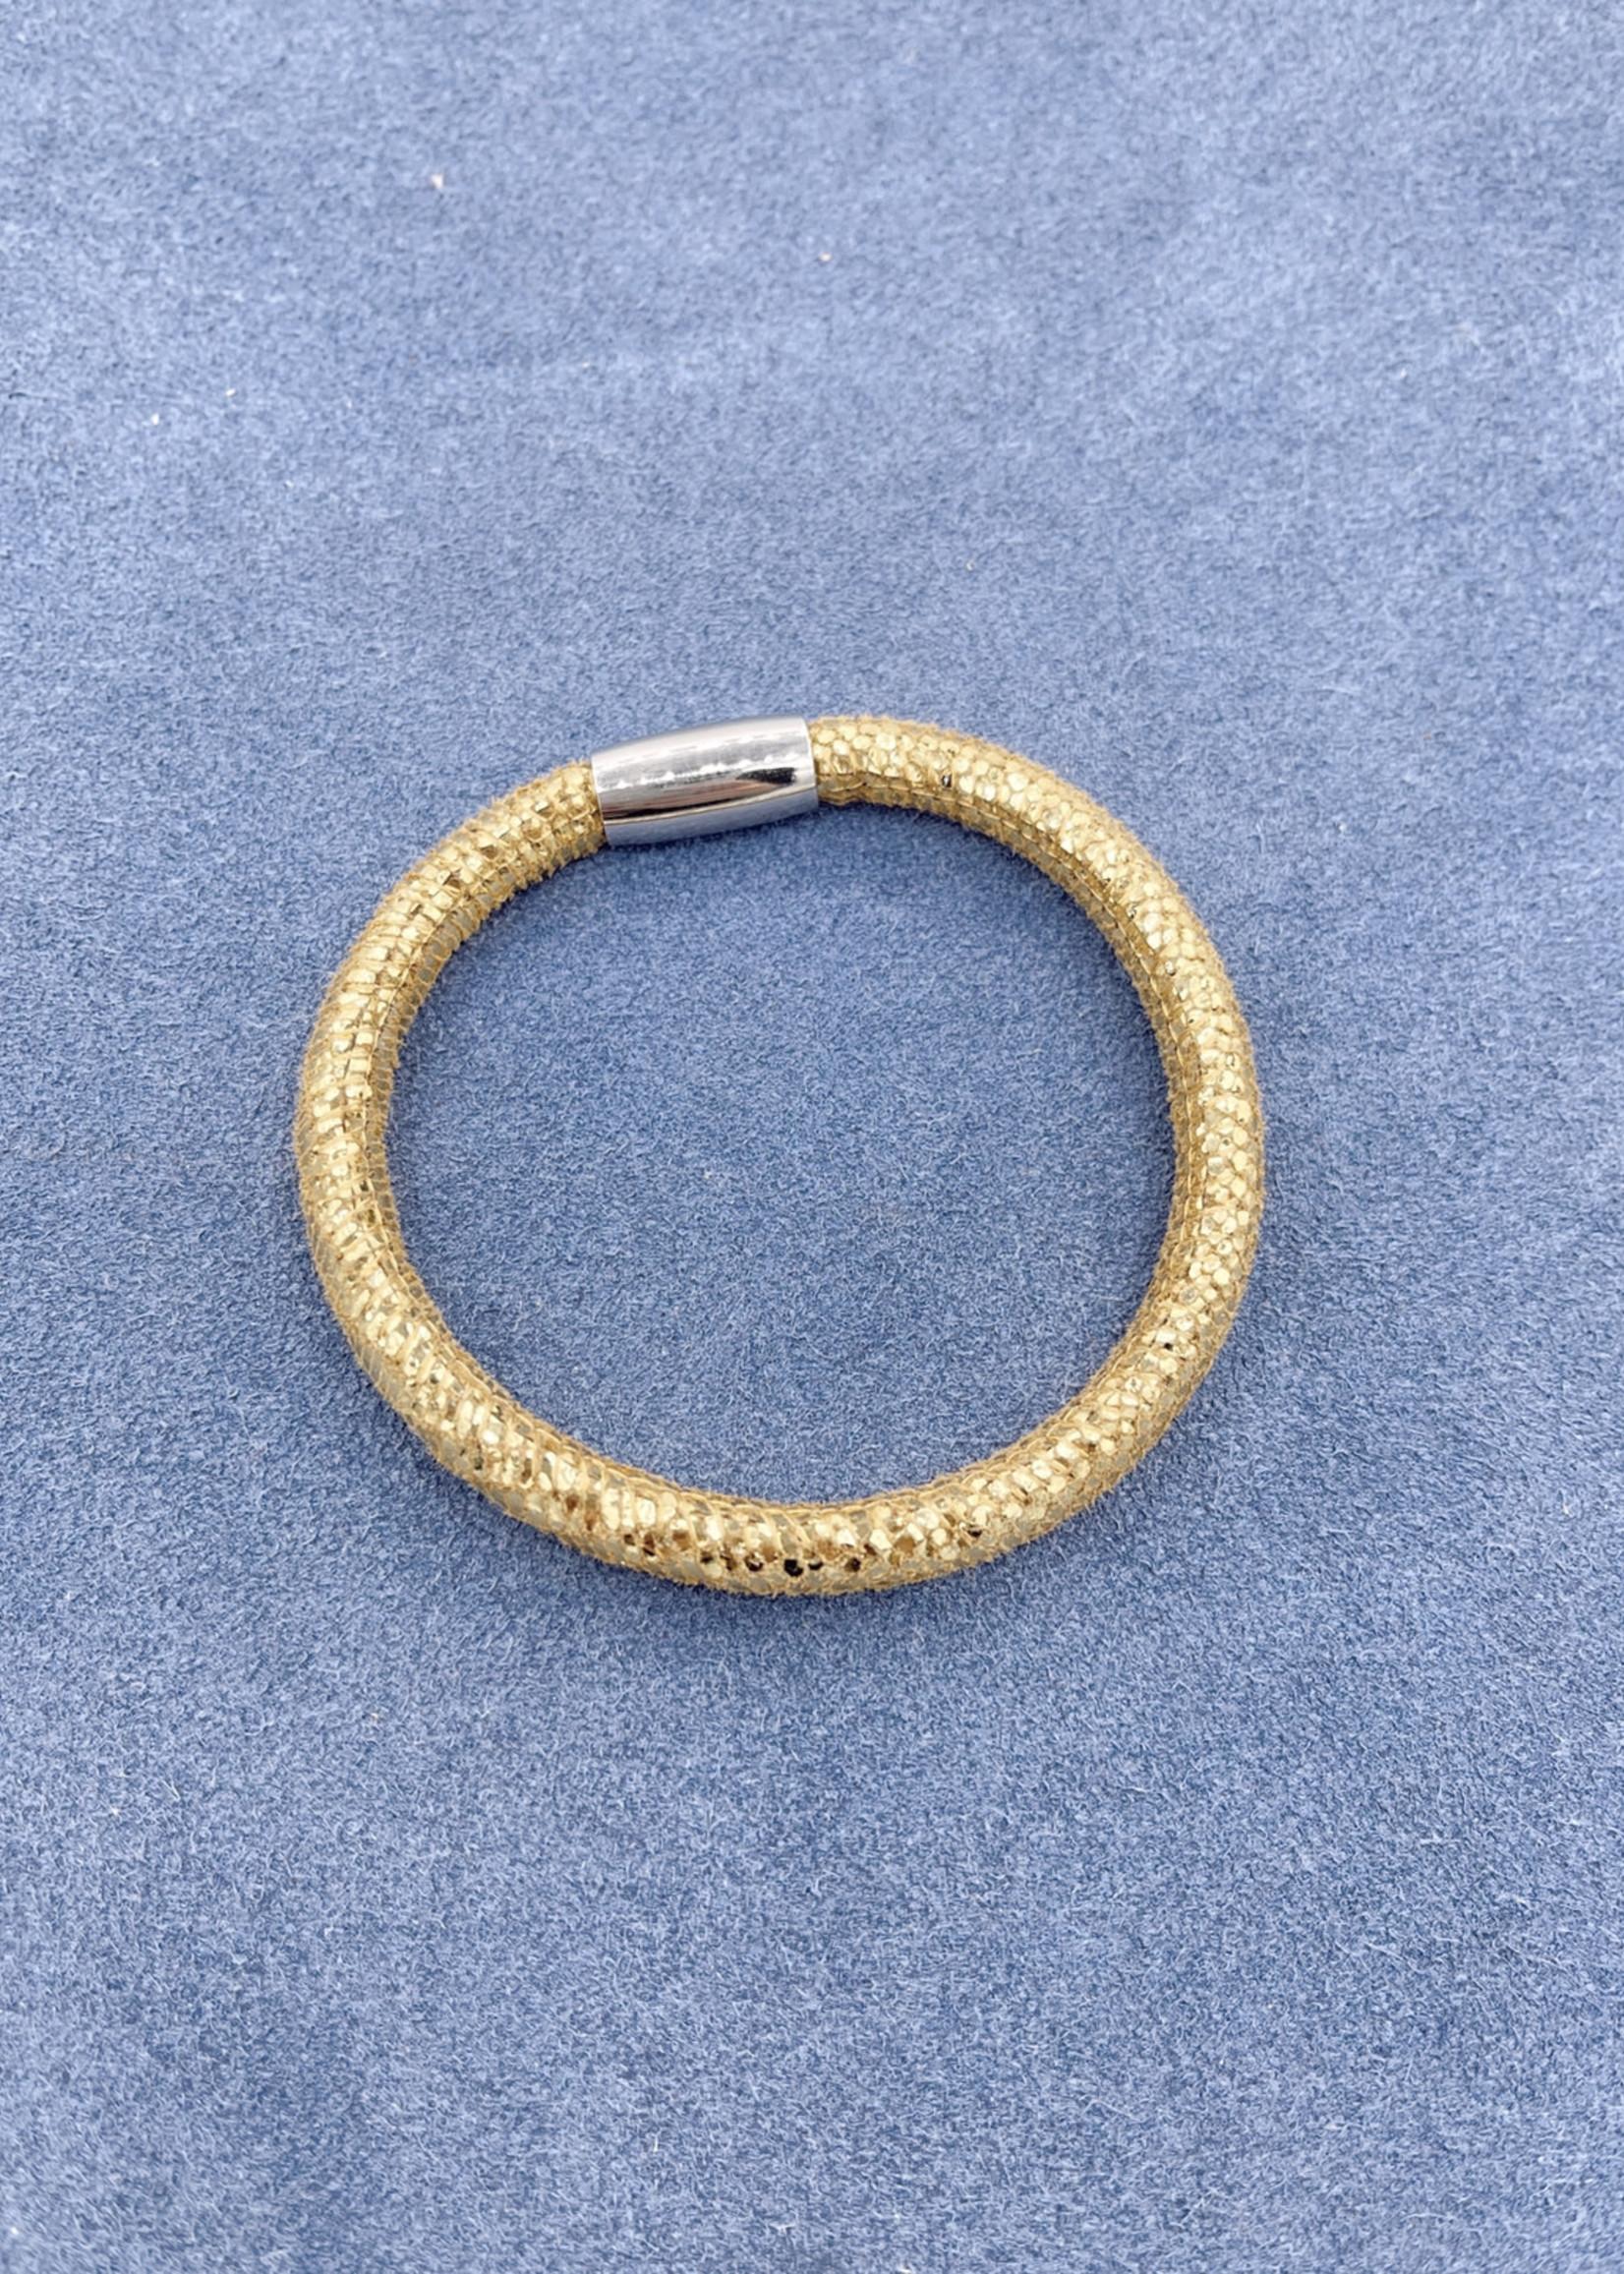 Stardom Gold with Glitter Single Strand Leather Charm Bracelet